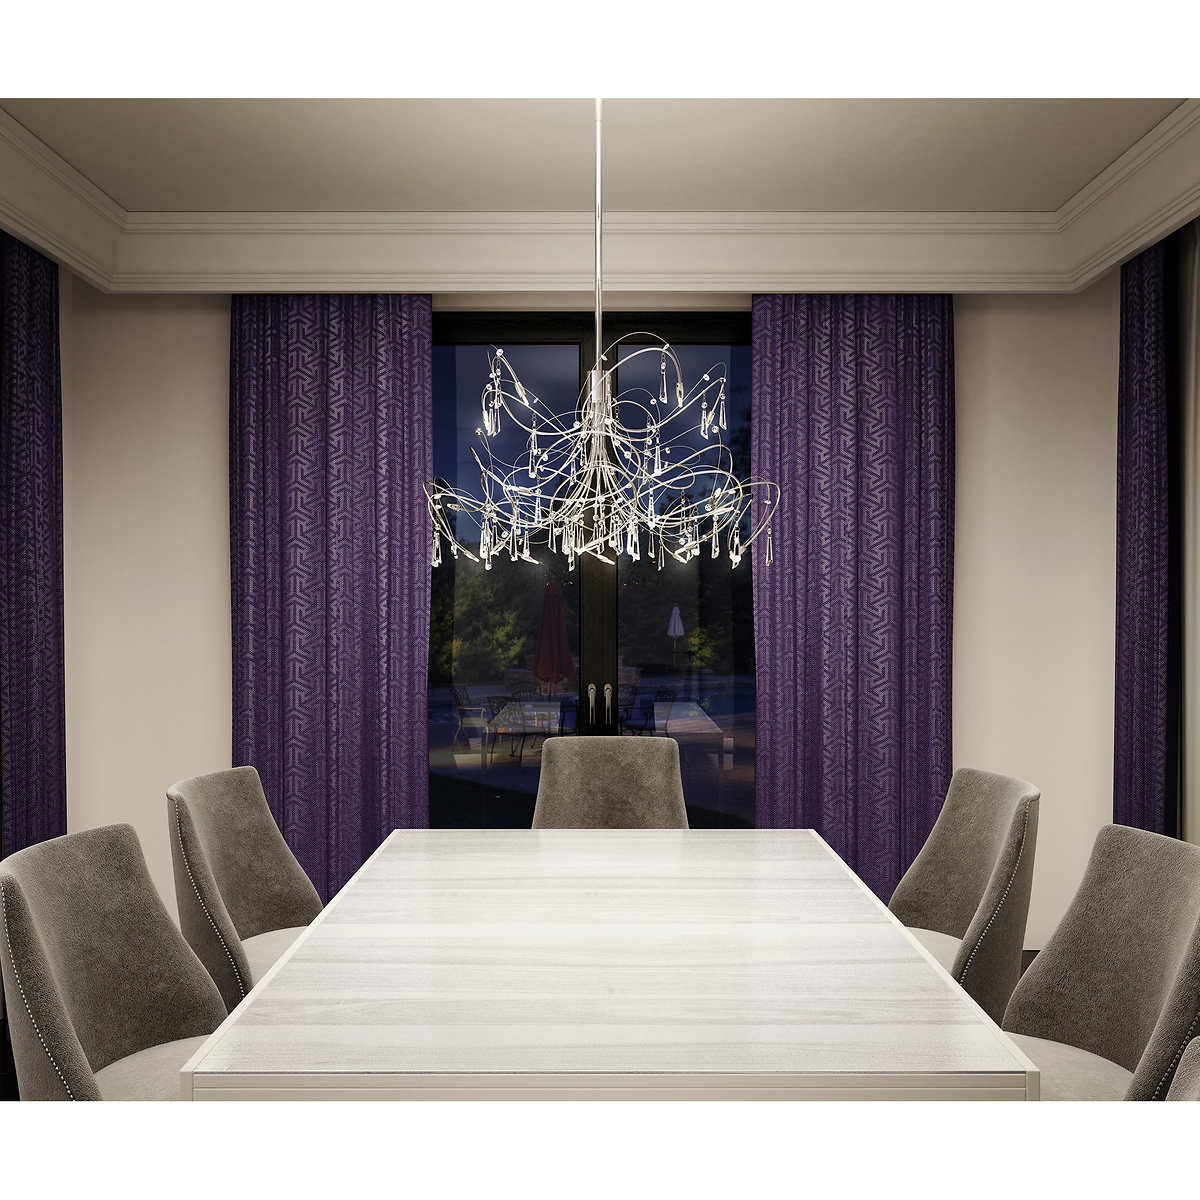 Cosmos 27 led chandelier by artika click to zoom arubaitofo Gallery